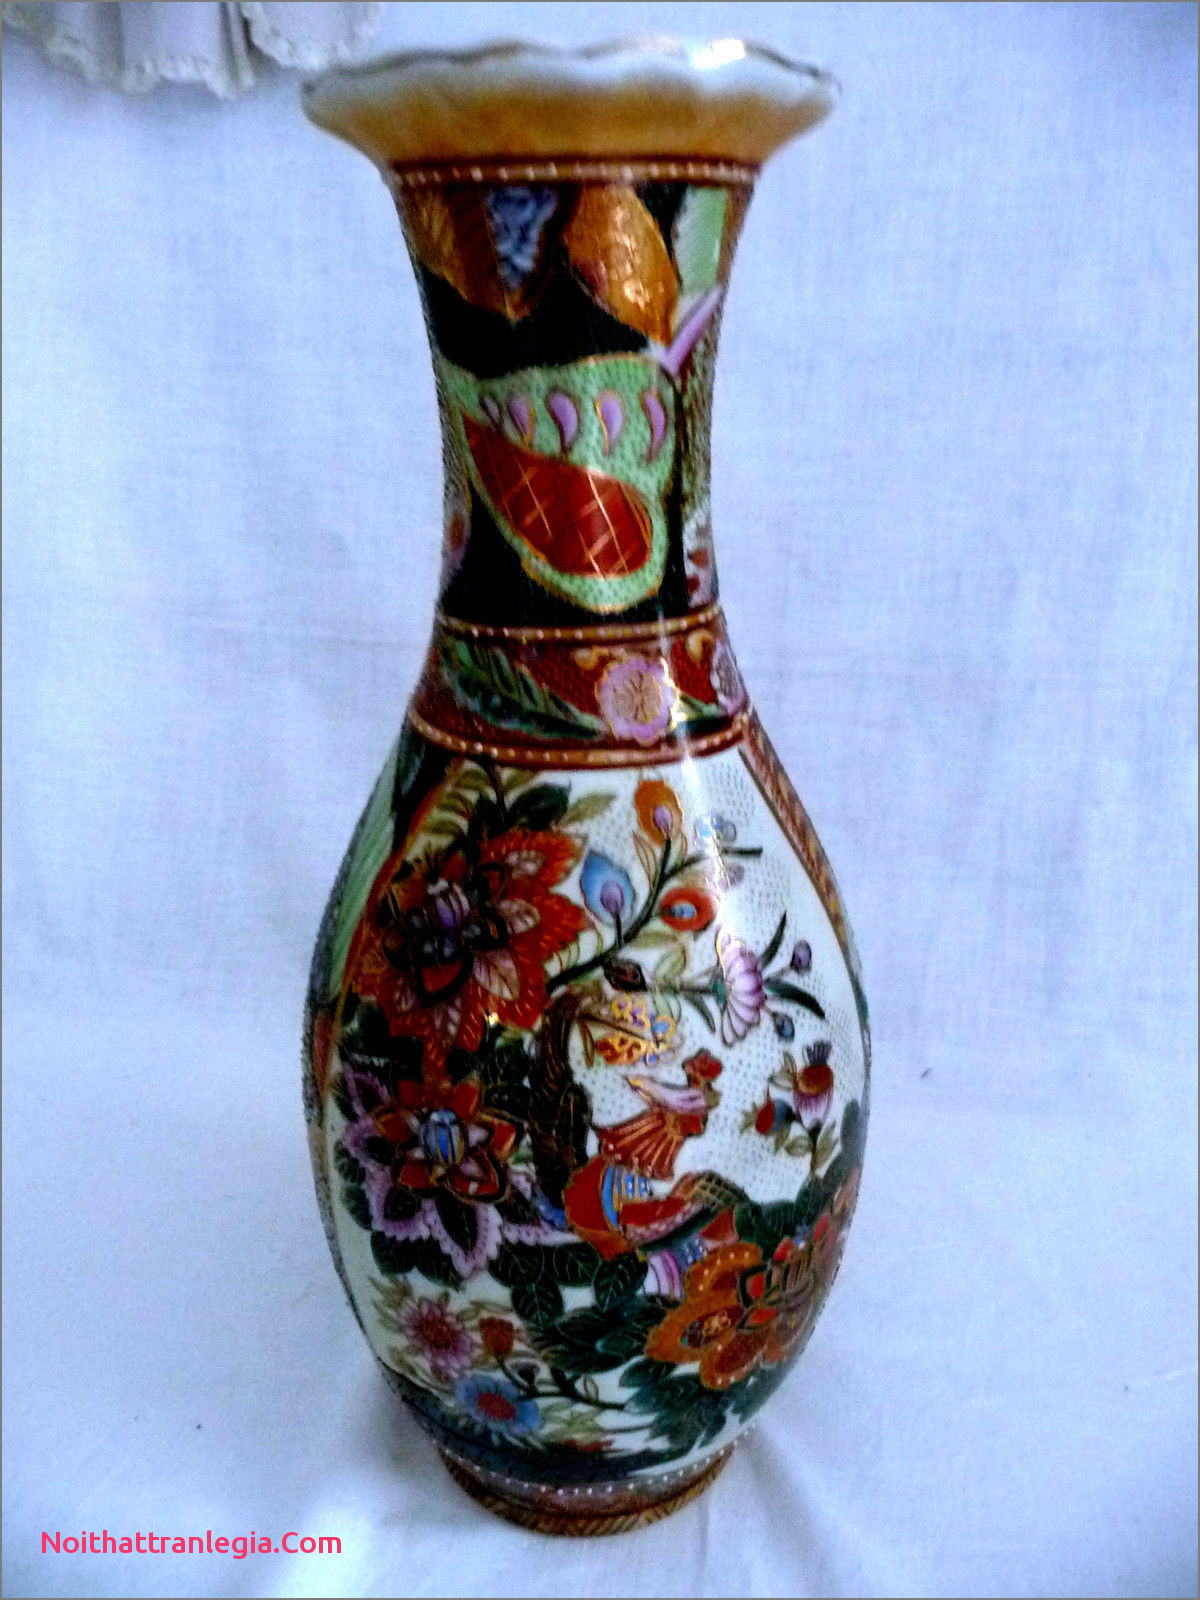 china blue fine porcelain vase of 20 chinese antique vase noithattranlegia vases design for 1 von 11 siehe mehr